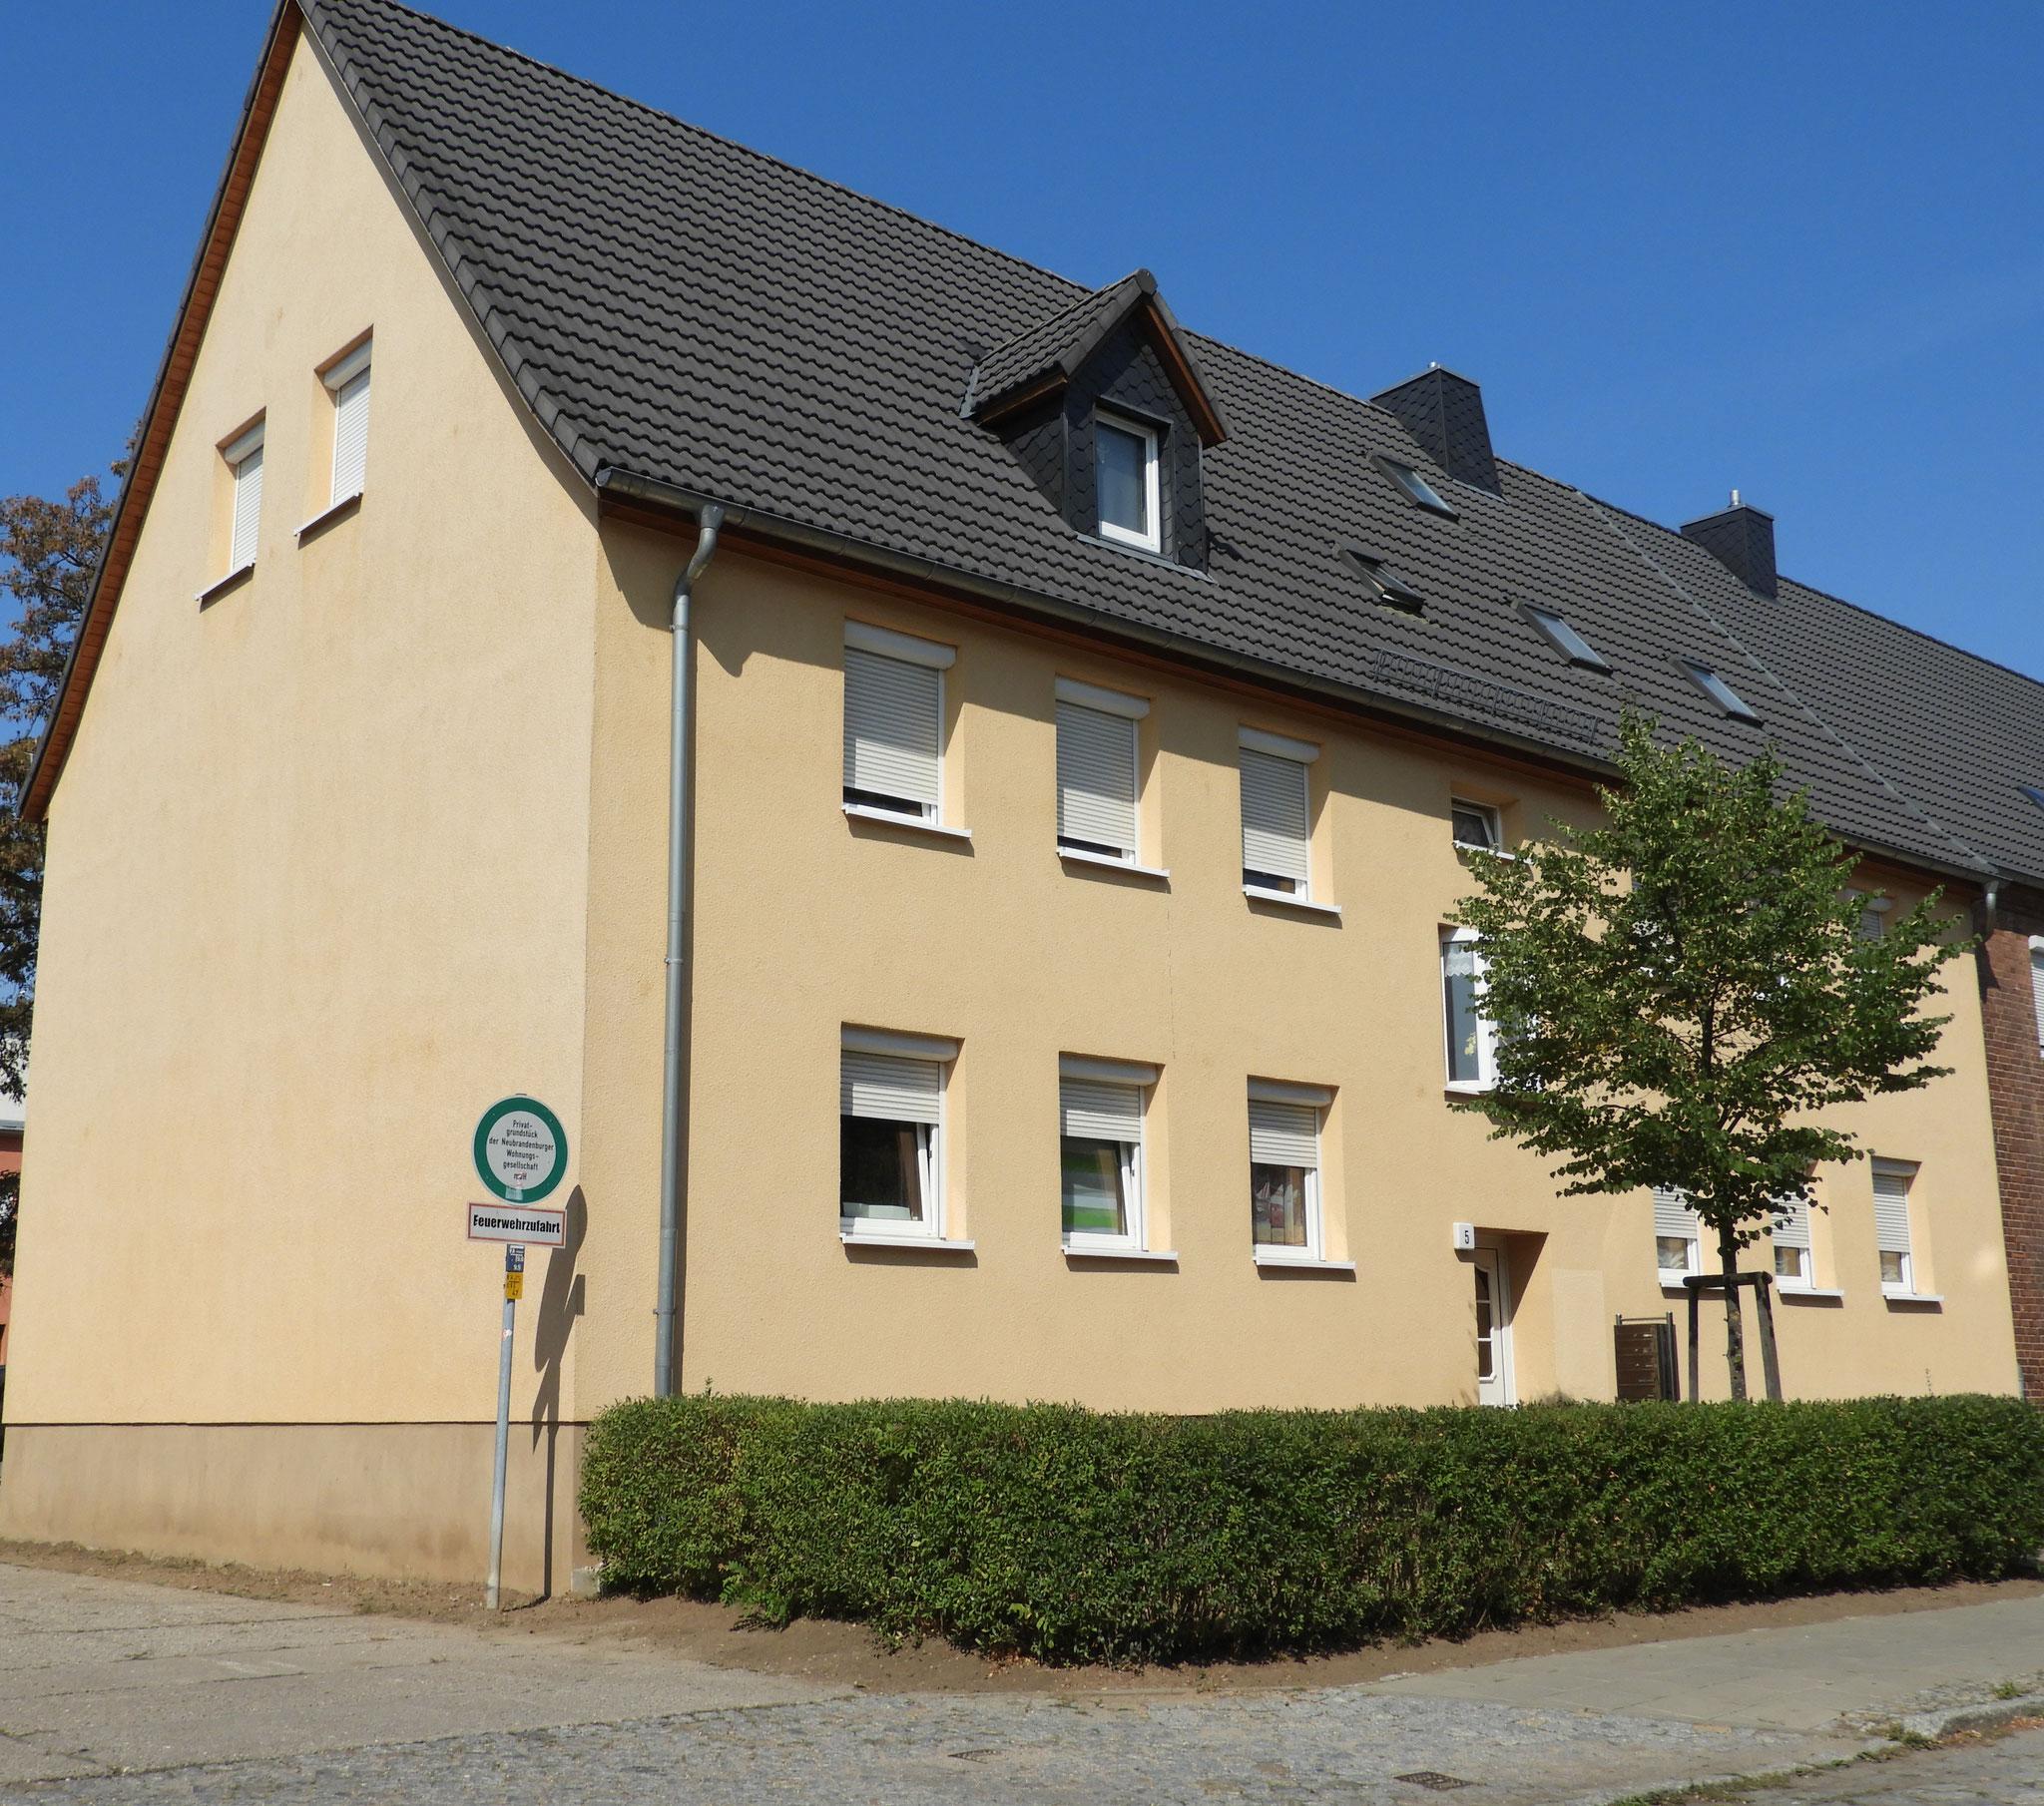 MFRH in Neubrandenburg